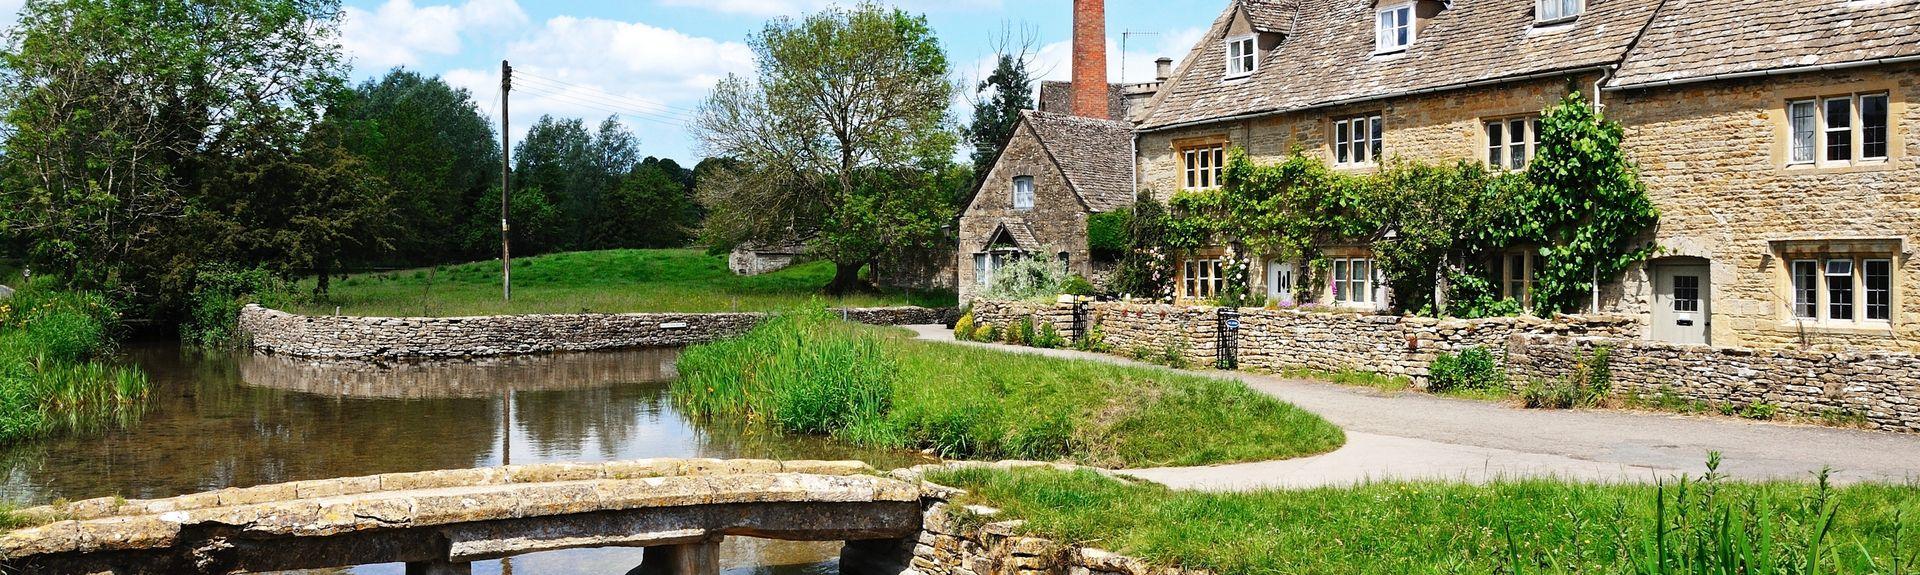 Cotswolds, England, Storbritannia